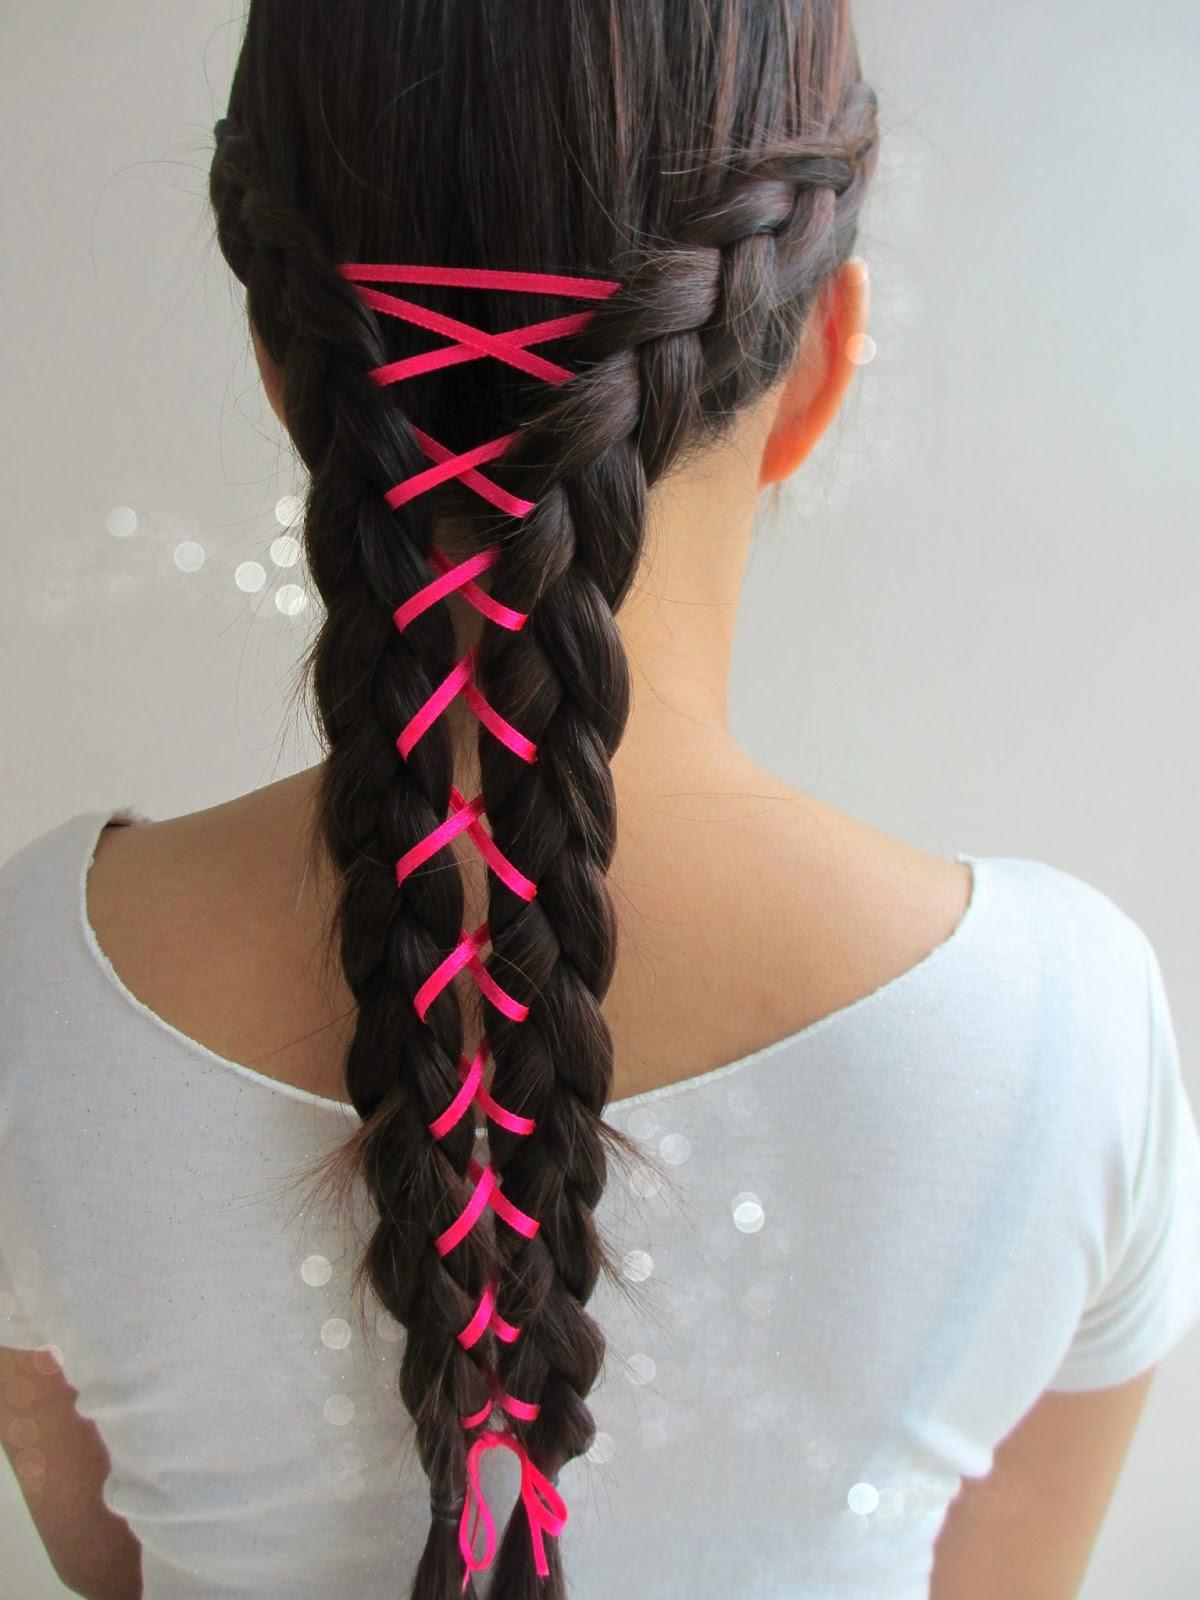 Real Asian Beauty Corset Braid Hair Tutorial